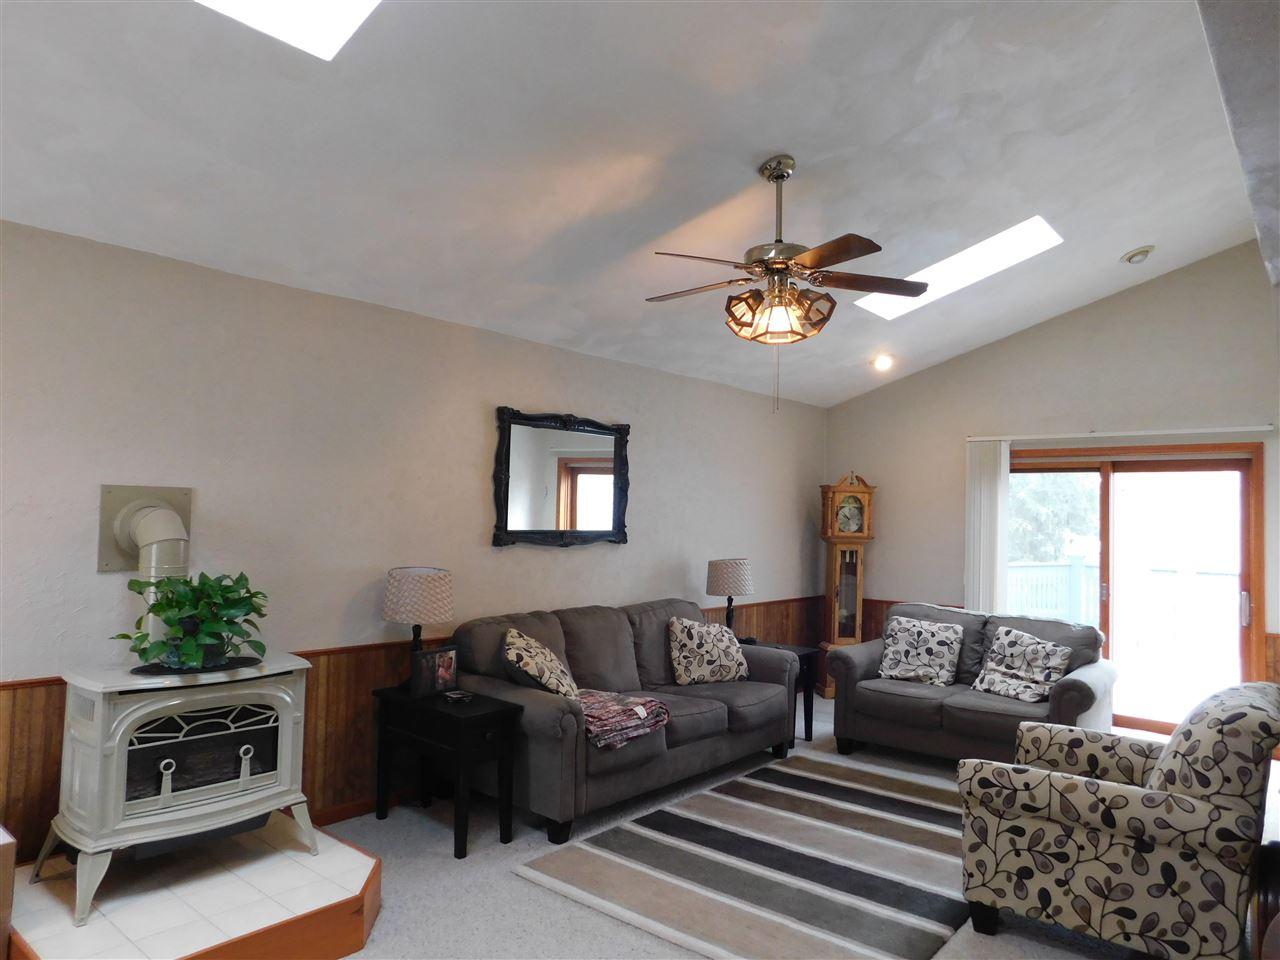 811 N Beaumont Rd, Prairie Du Chien, WI 53821